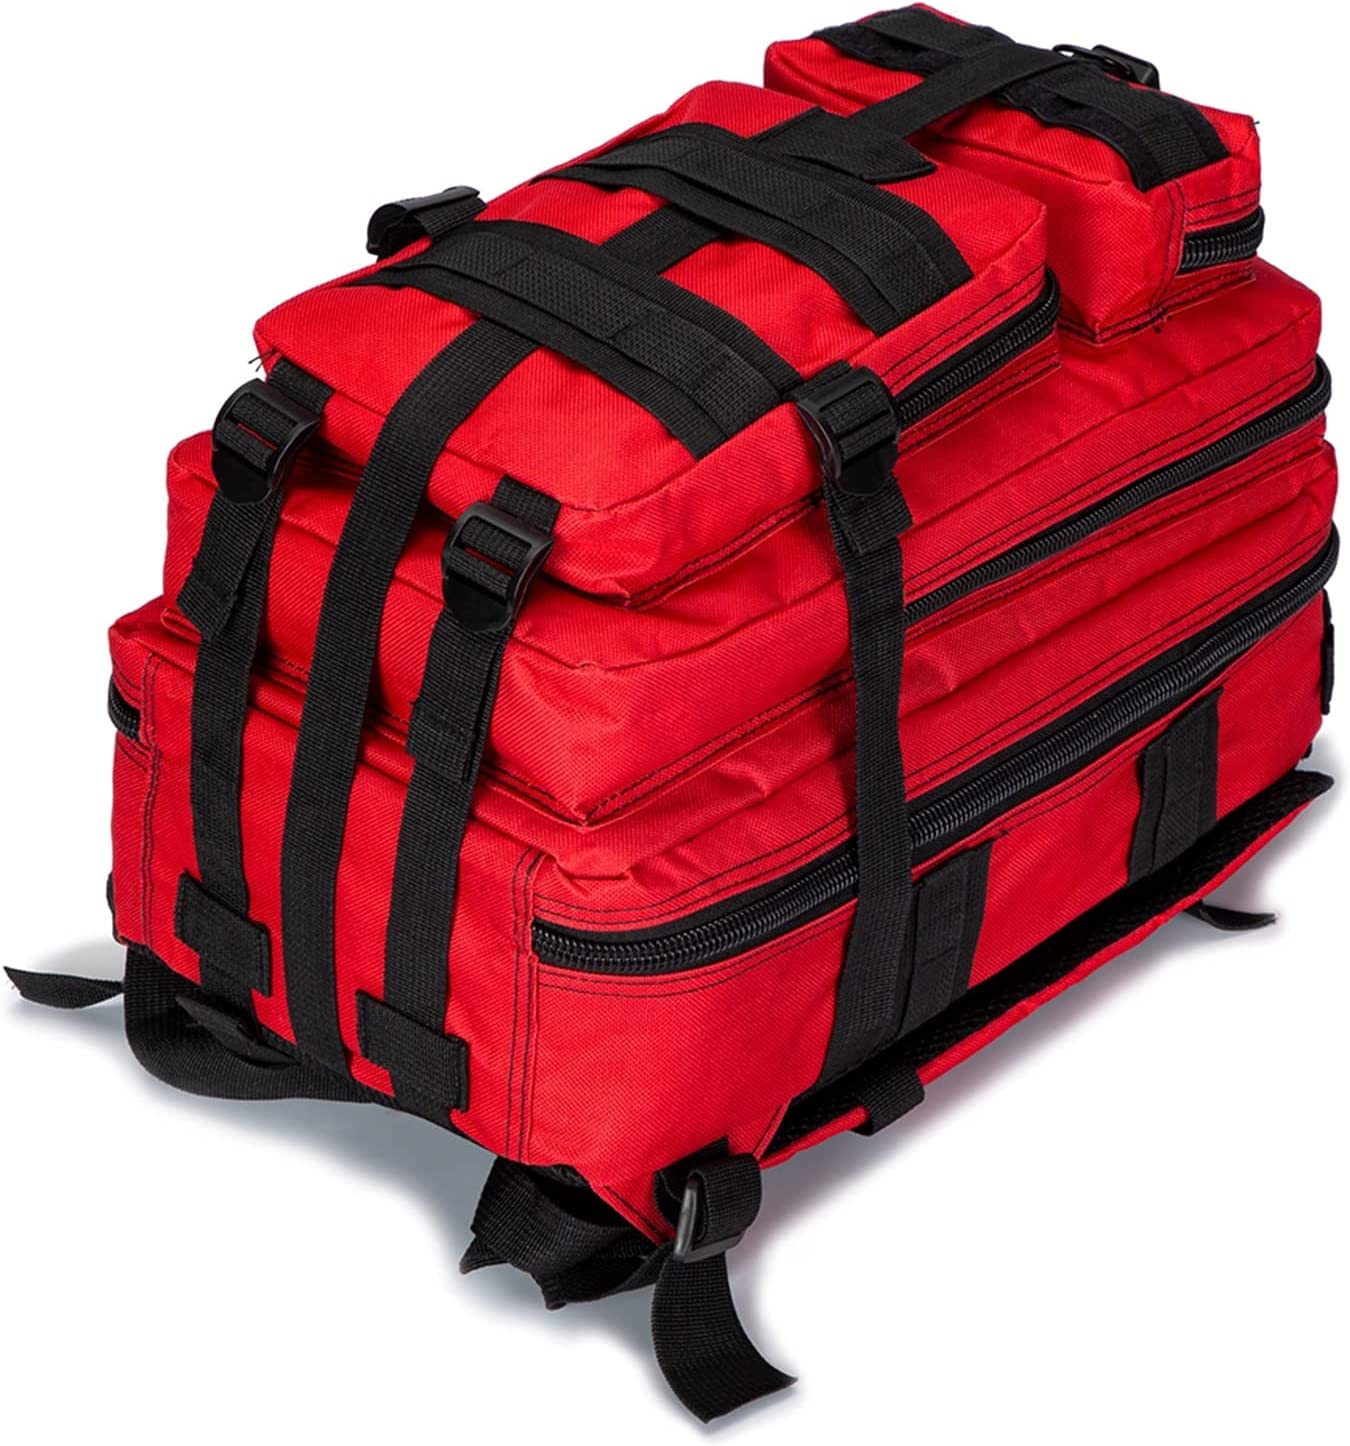 JIU SI Mochila táctica de Primeros Auxilios Molle Molle Bag Trauma Responder Bolsa de Utilidad médico Mochila Militar para al Aire Libre Backcountry